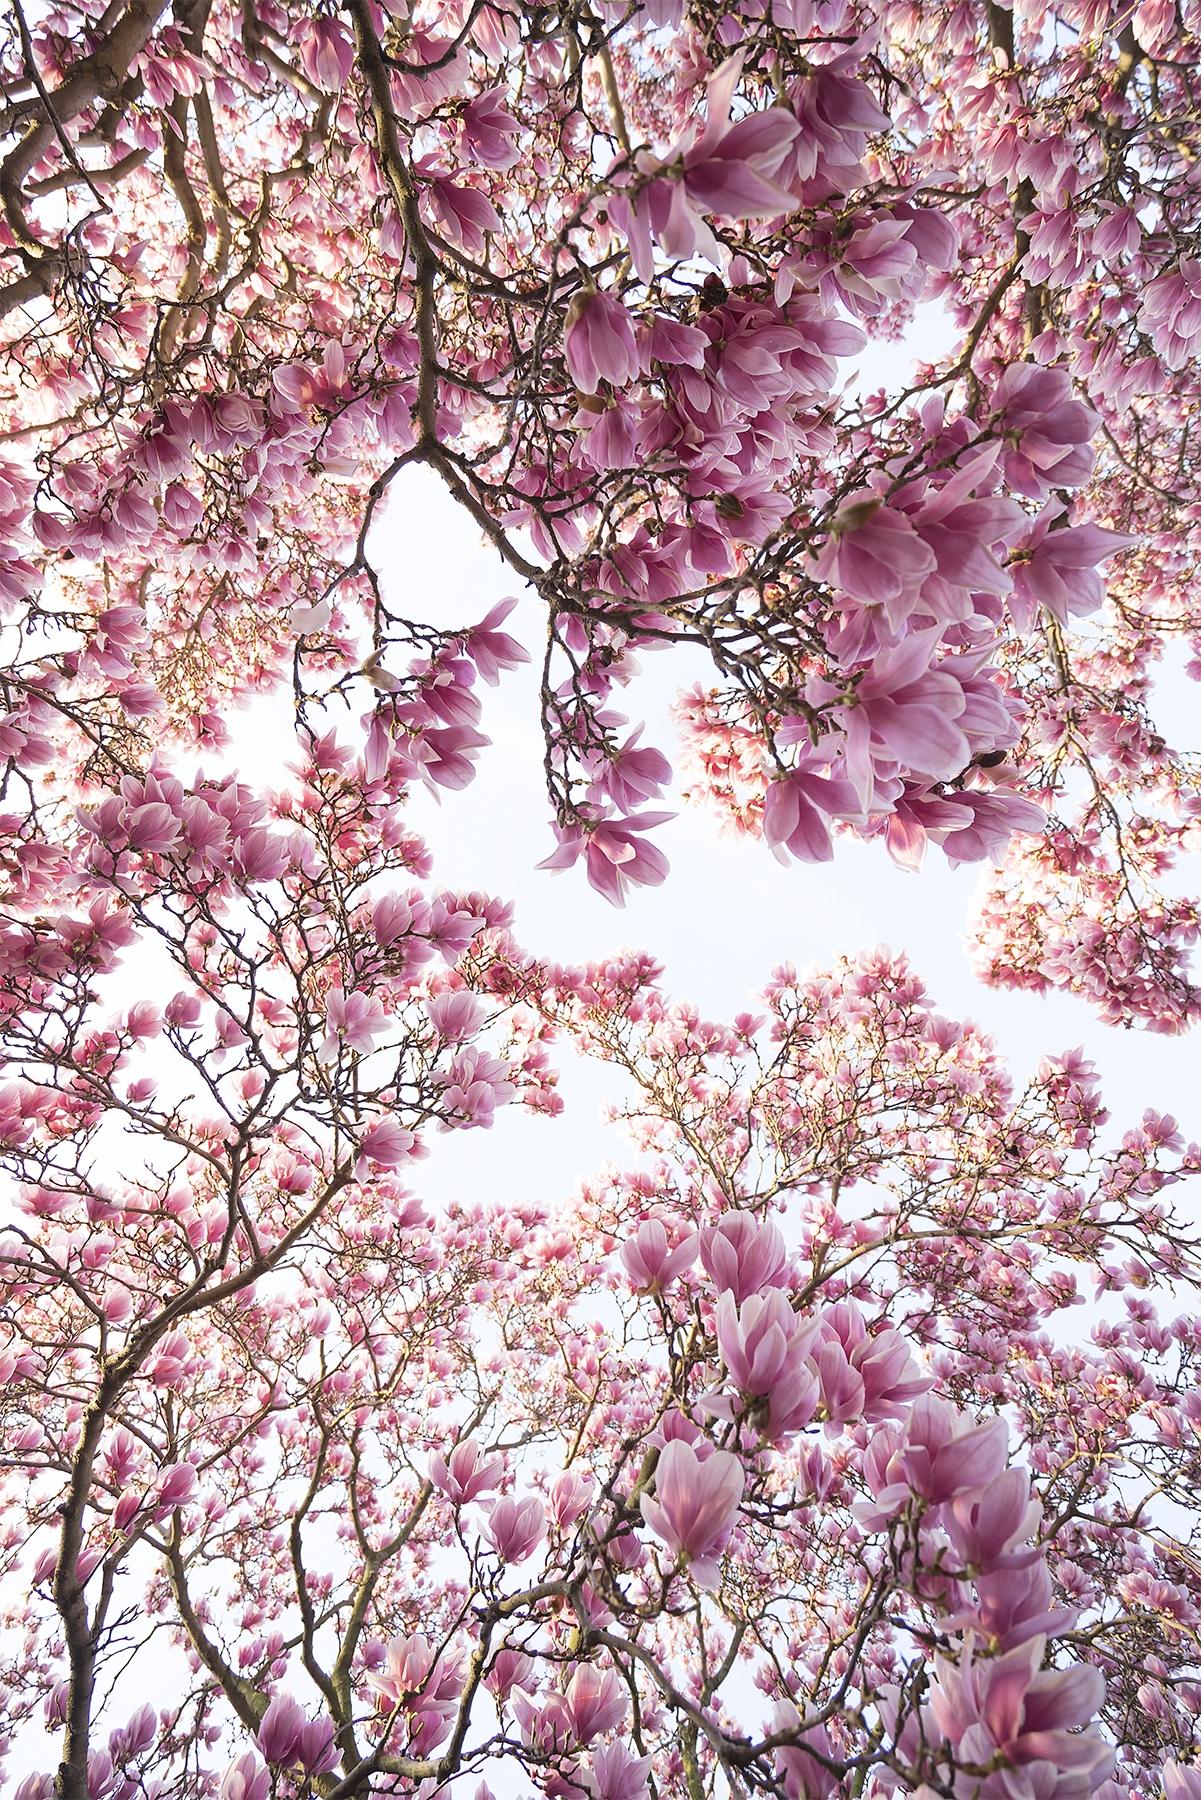 flowers, pink, tree, magnolias, smithsonian, garden, look up, dream,